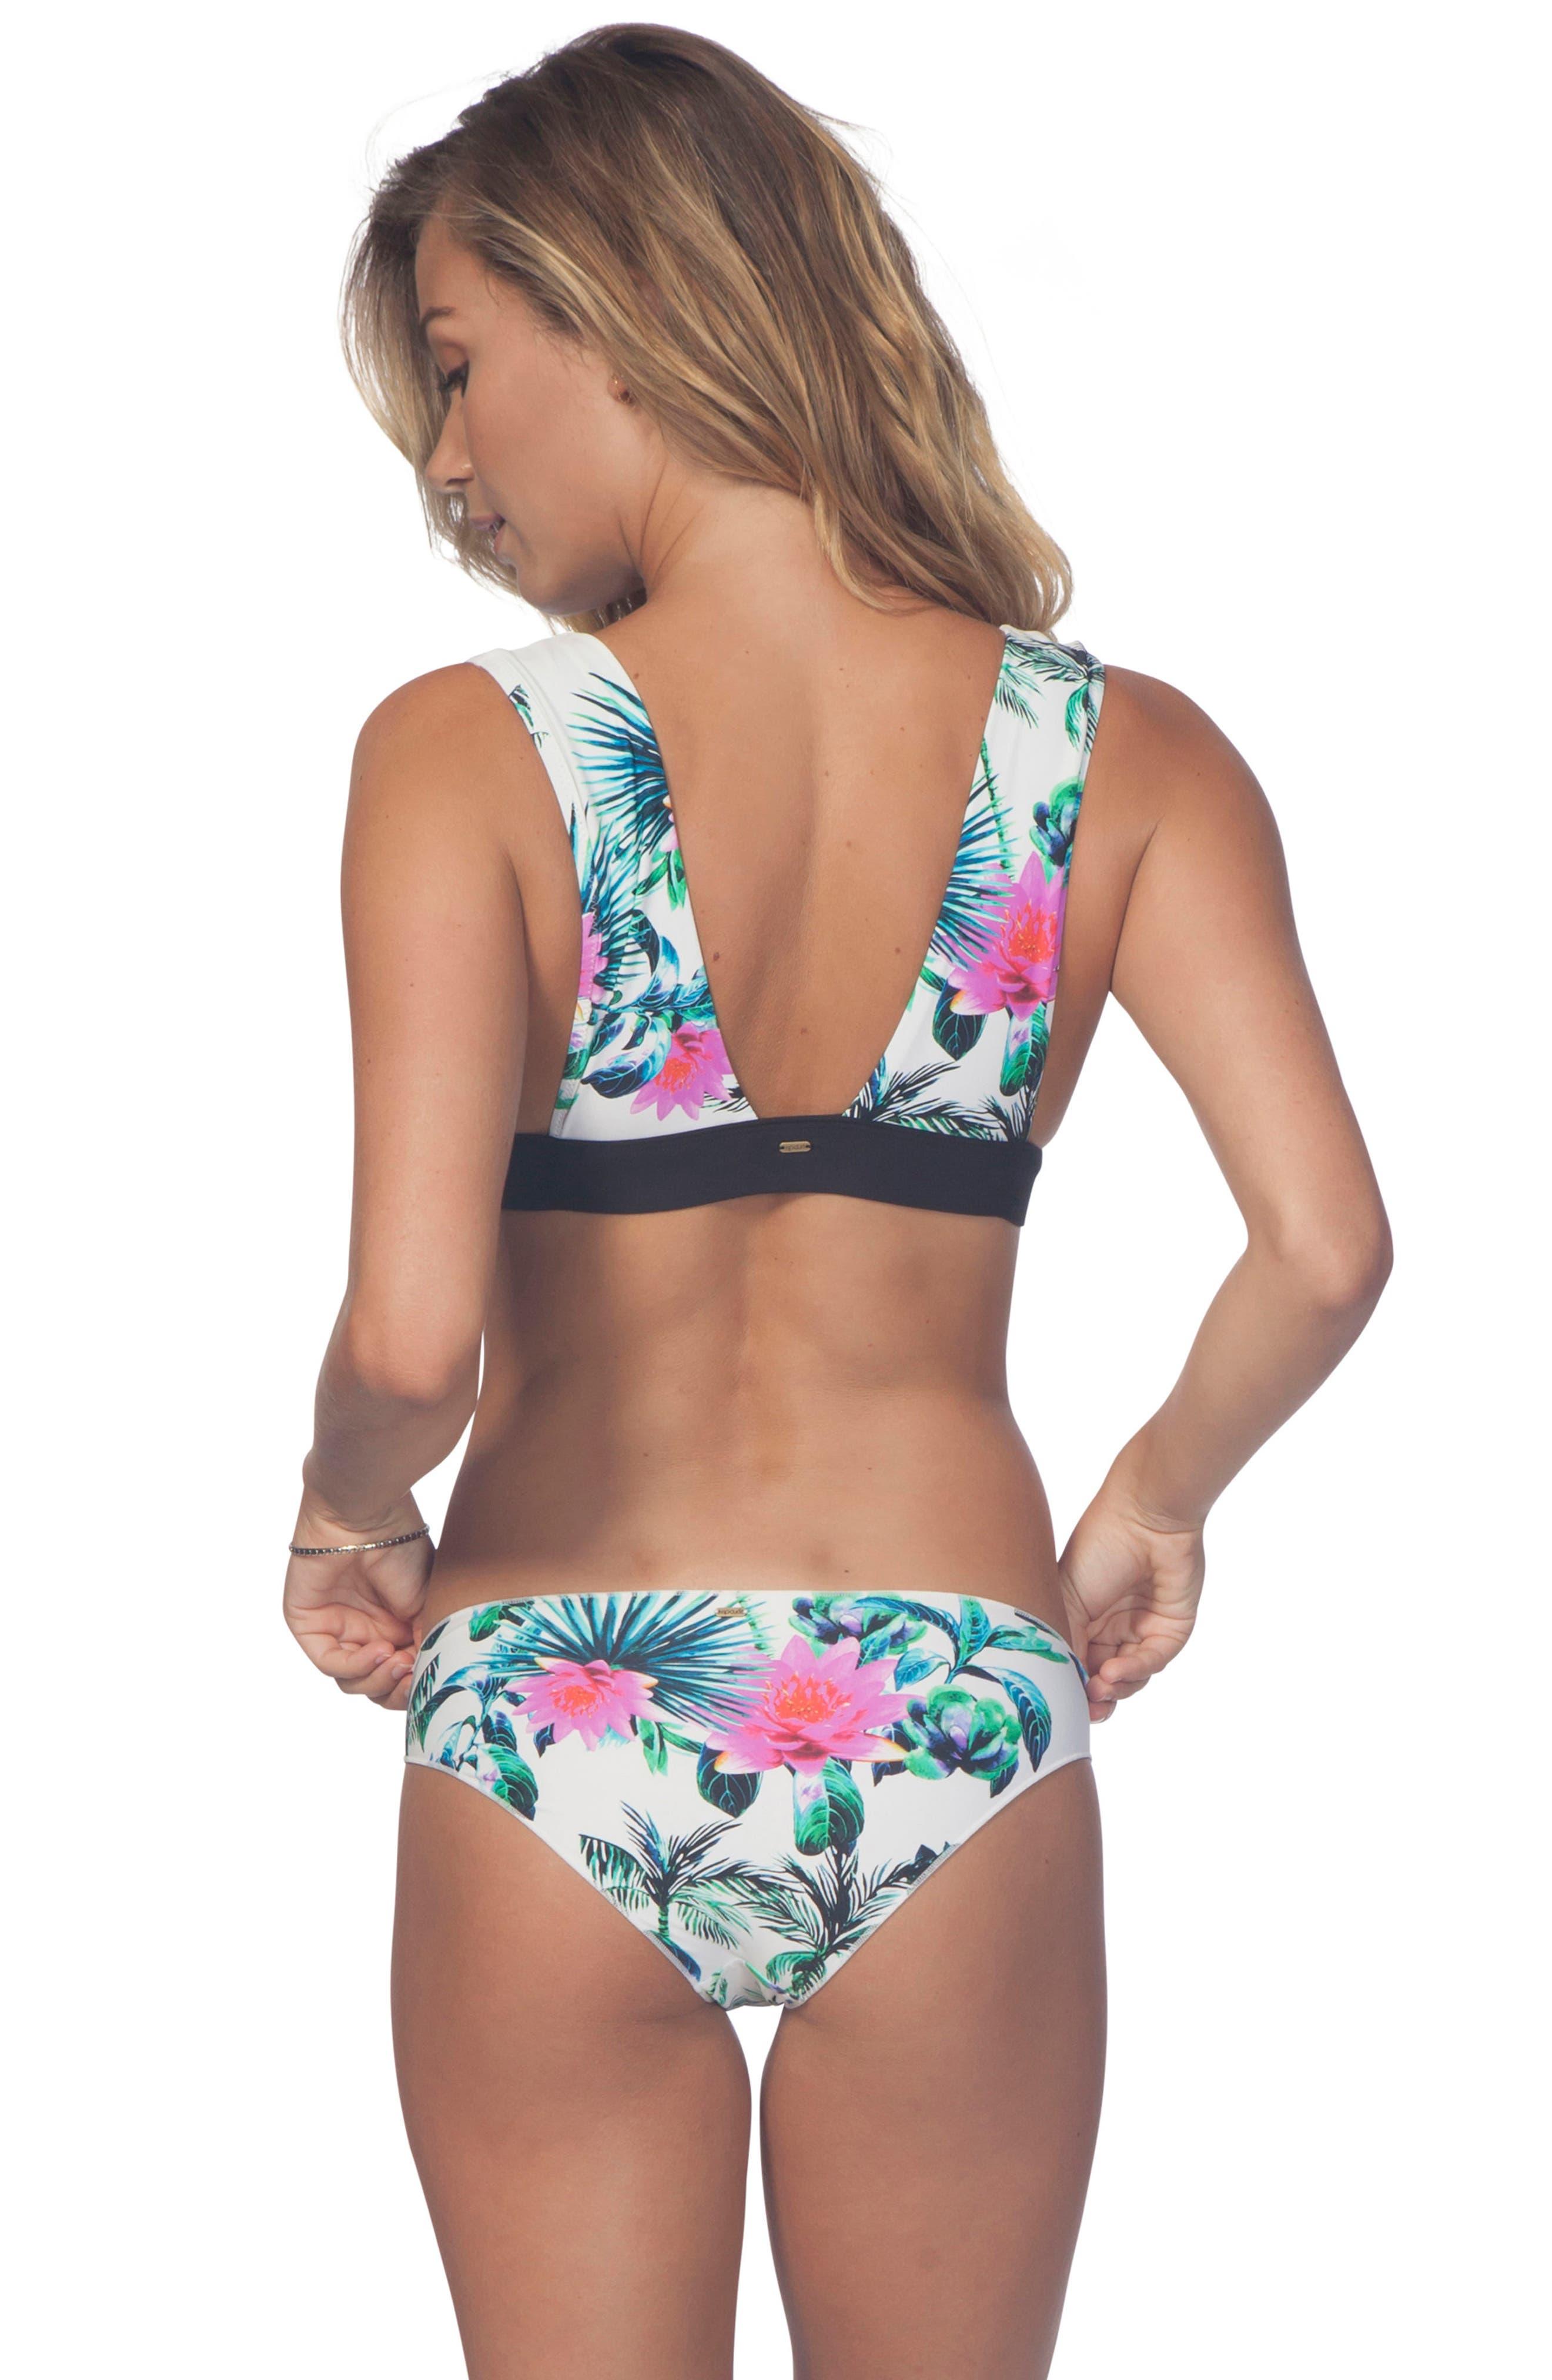 Palms Away Hipster Bikini Bottoms,                             Alternate thumbnail 3, color,                             100